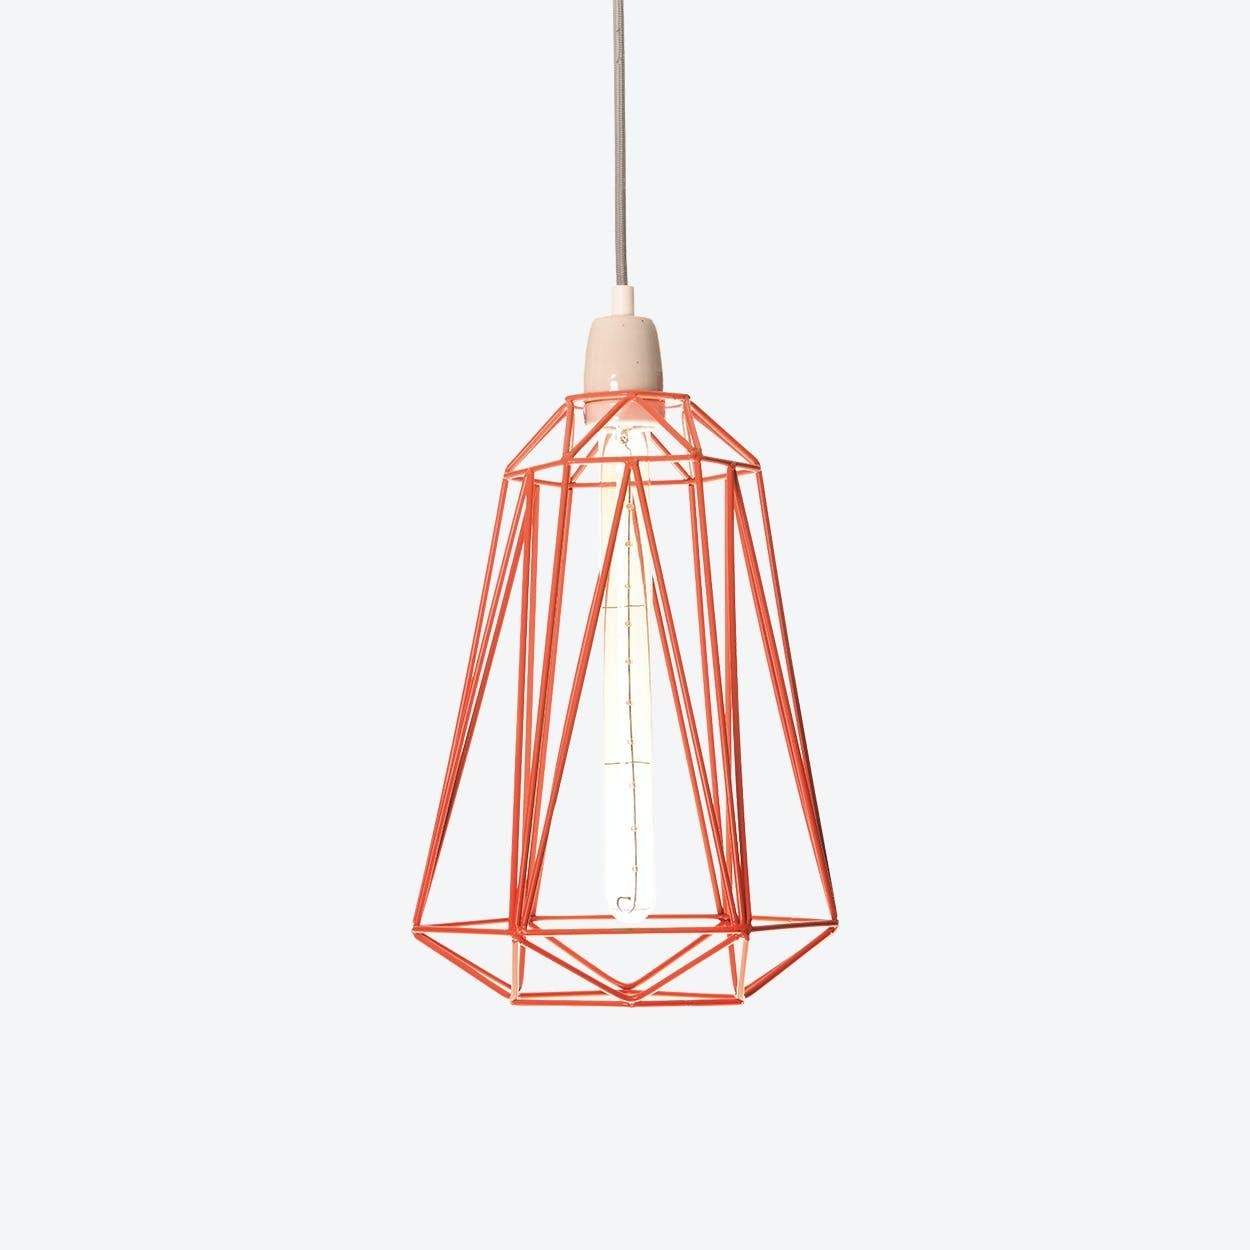 Industrial Pendant Light Medium Diamond in Orange with Grey Cord